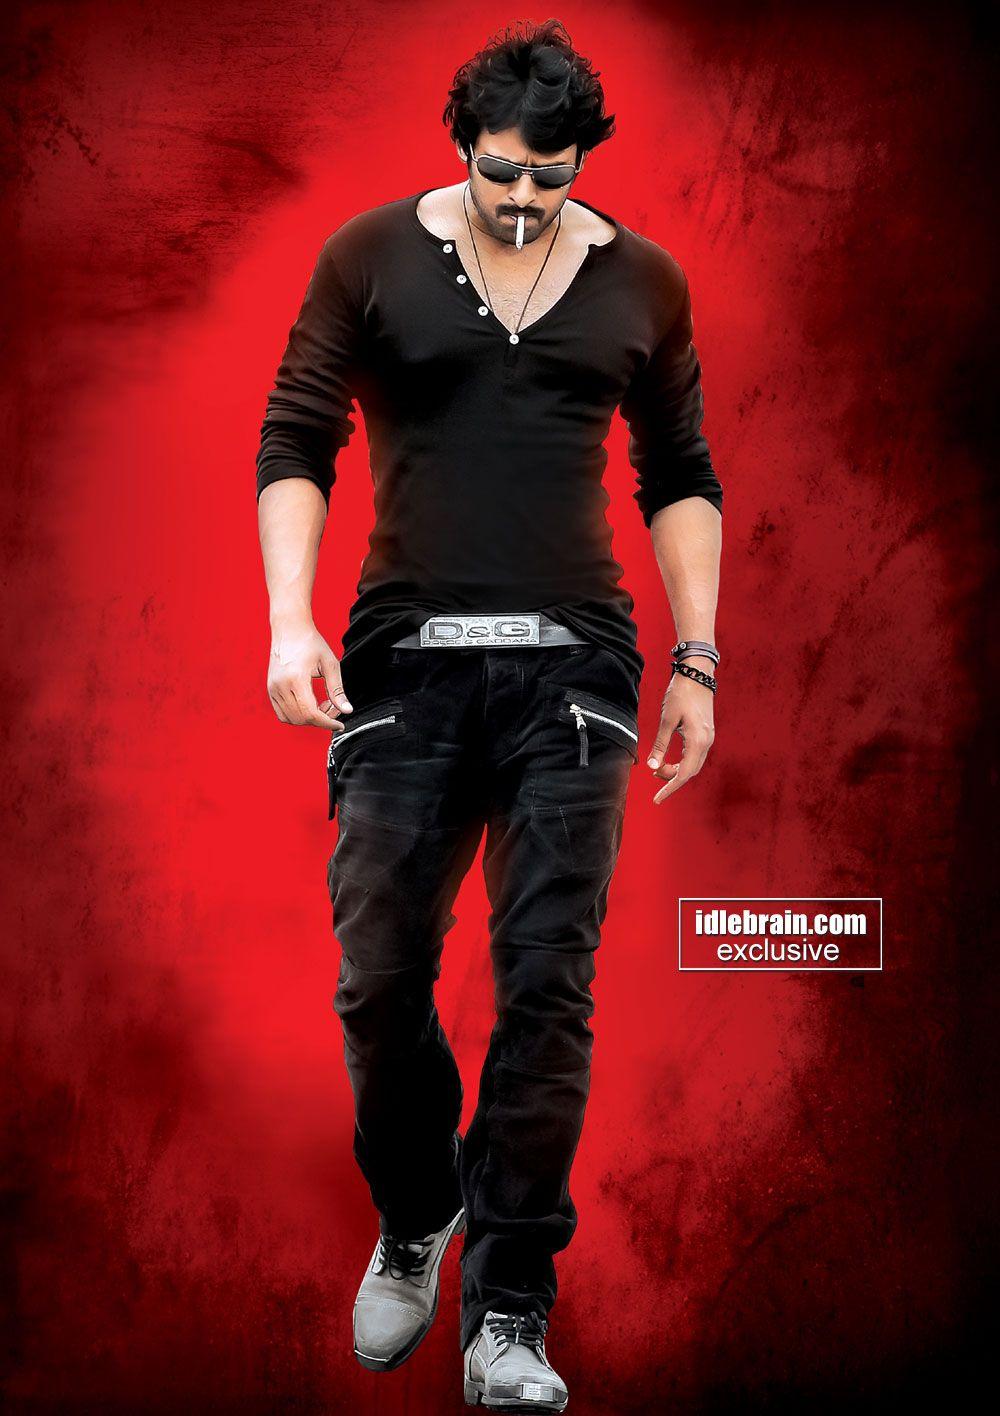 Pin By Veenu Dawson On My Hero S In 2019 Prabhas Actor Movie